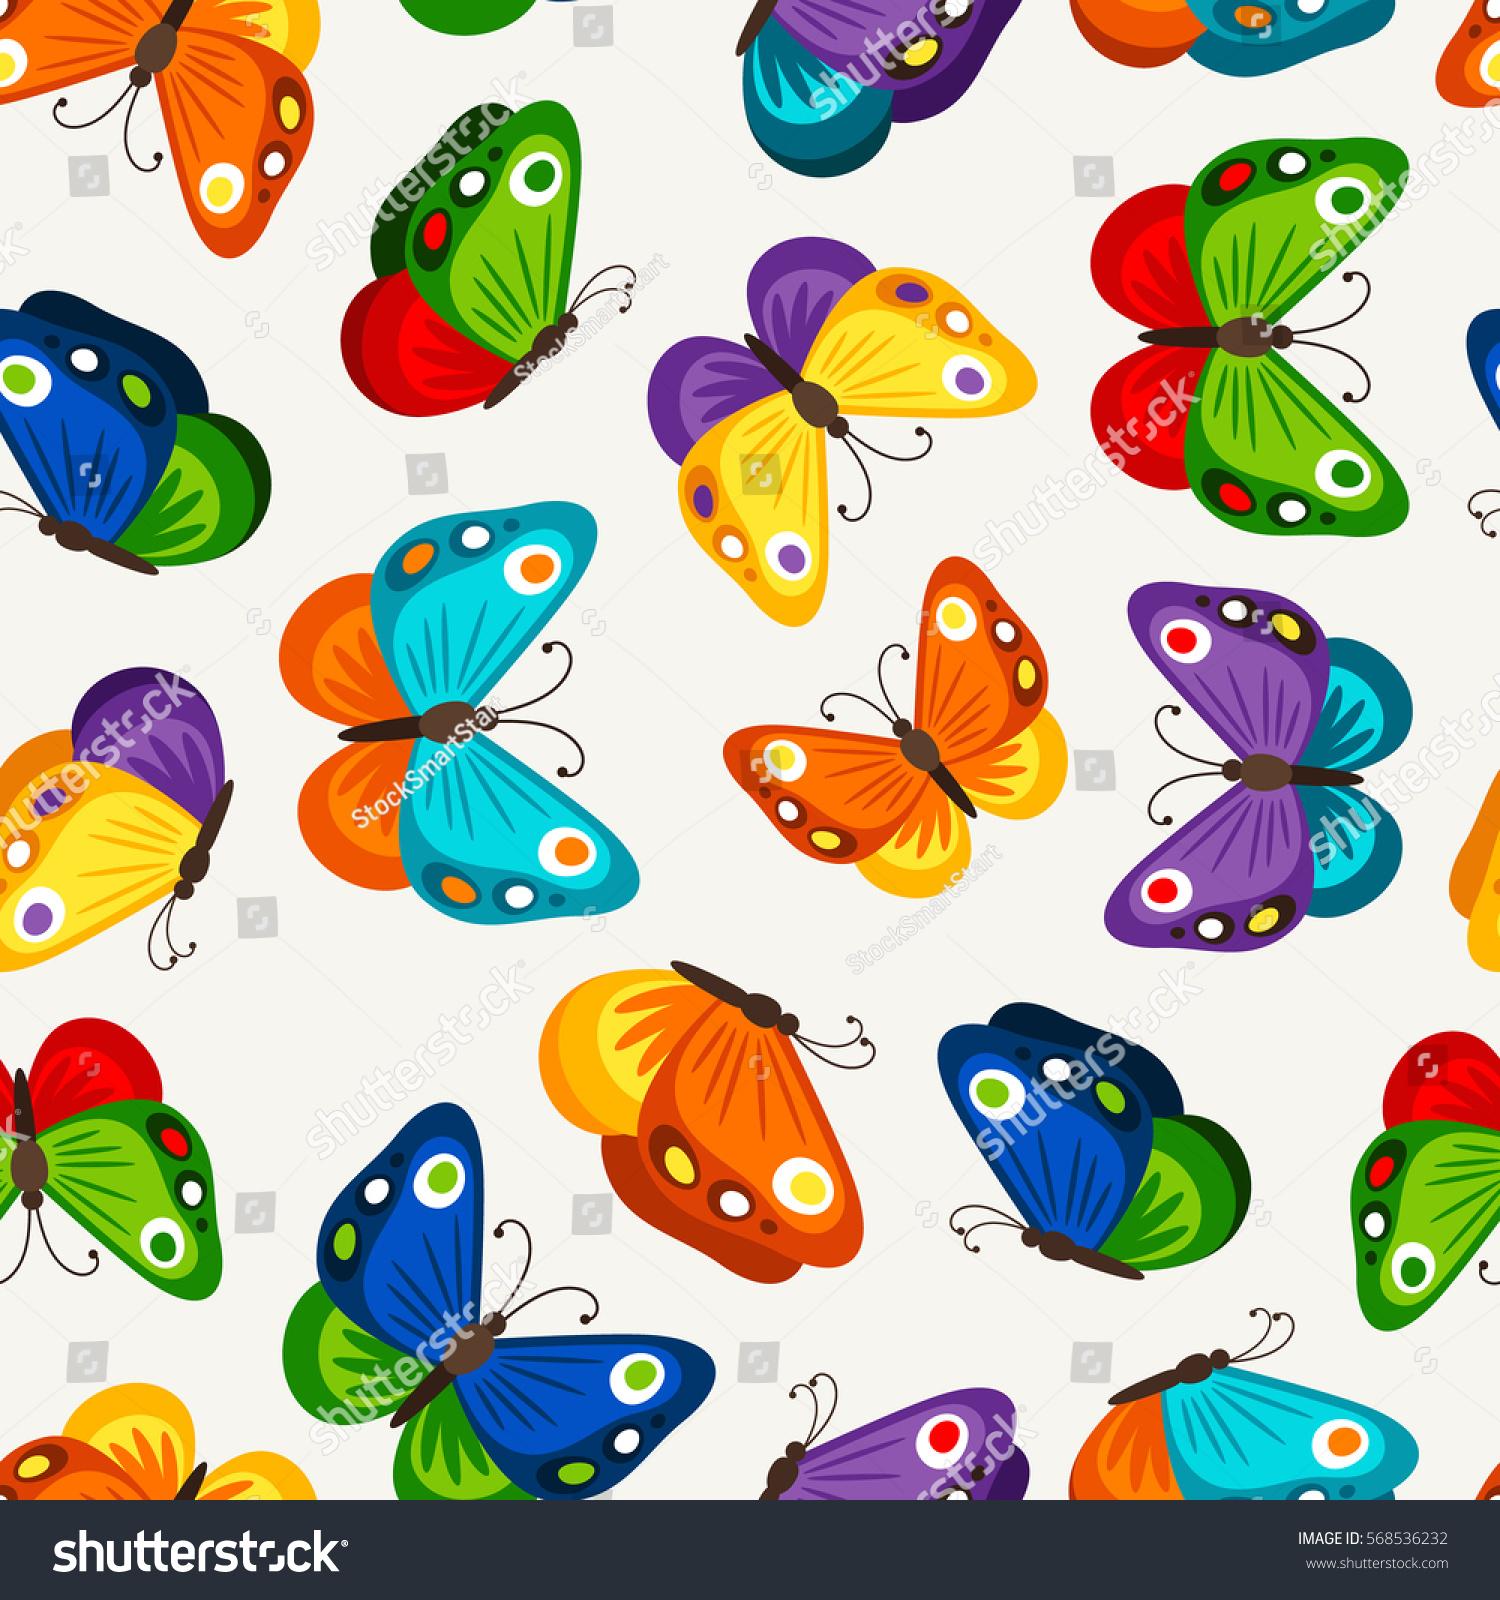 Uncategorized Images Of Butterflies For Children children butterfly seamless pattern vector fashion stock butterflies wallpaper for child